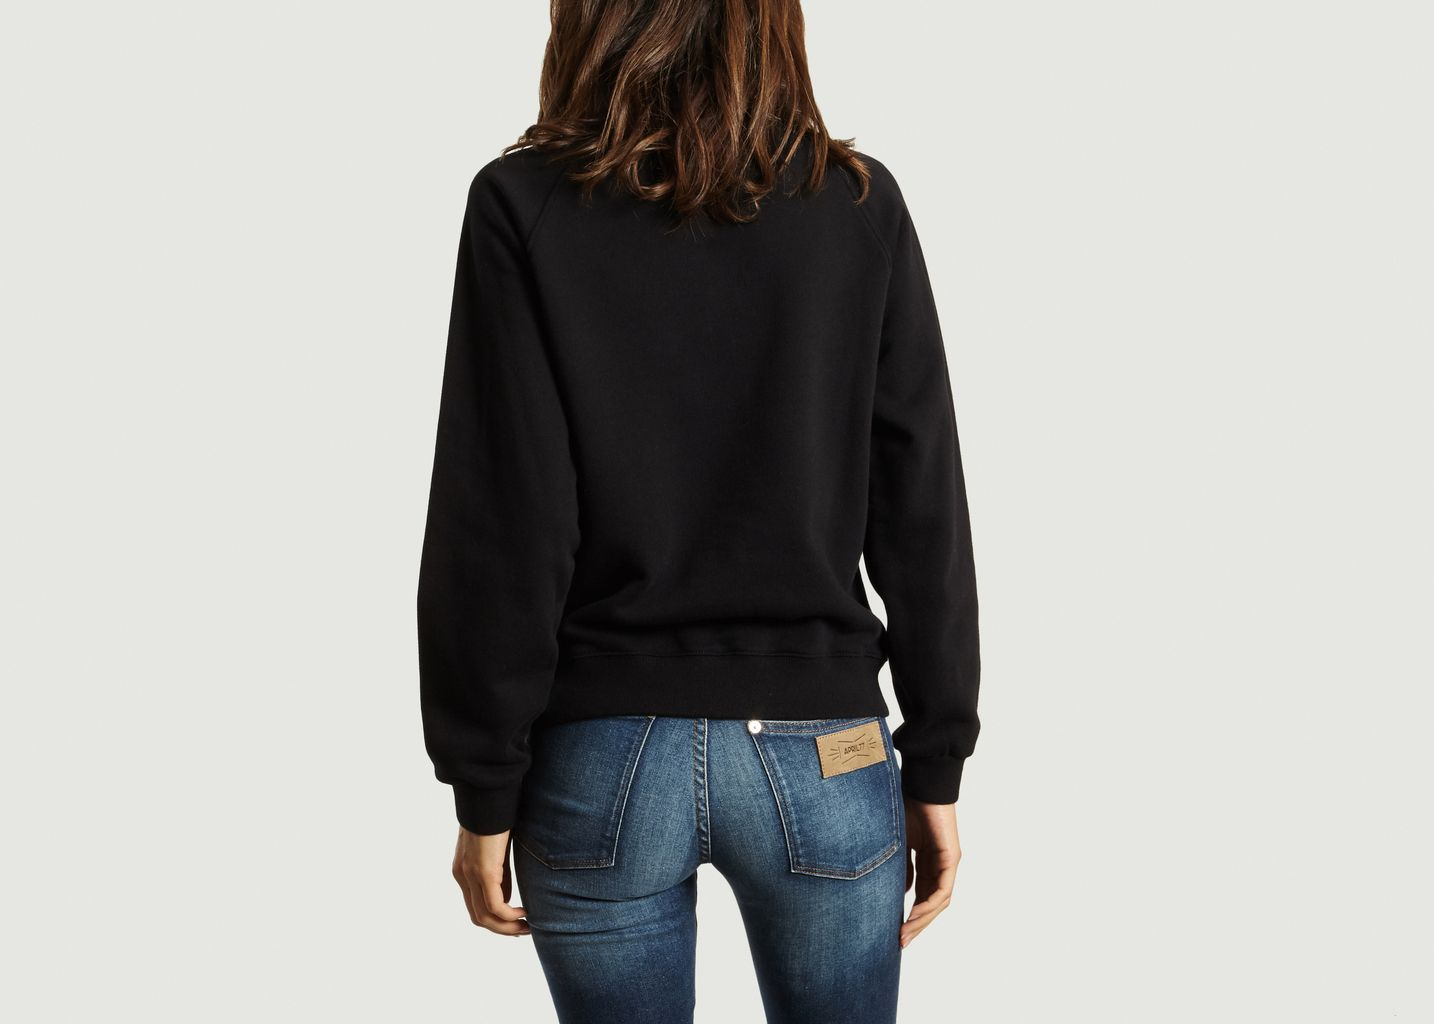 Sweatshirt Pixels Renard - Maison Kitsuné